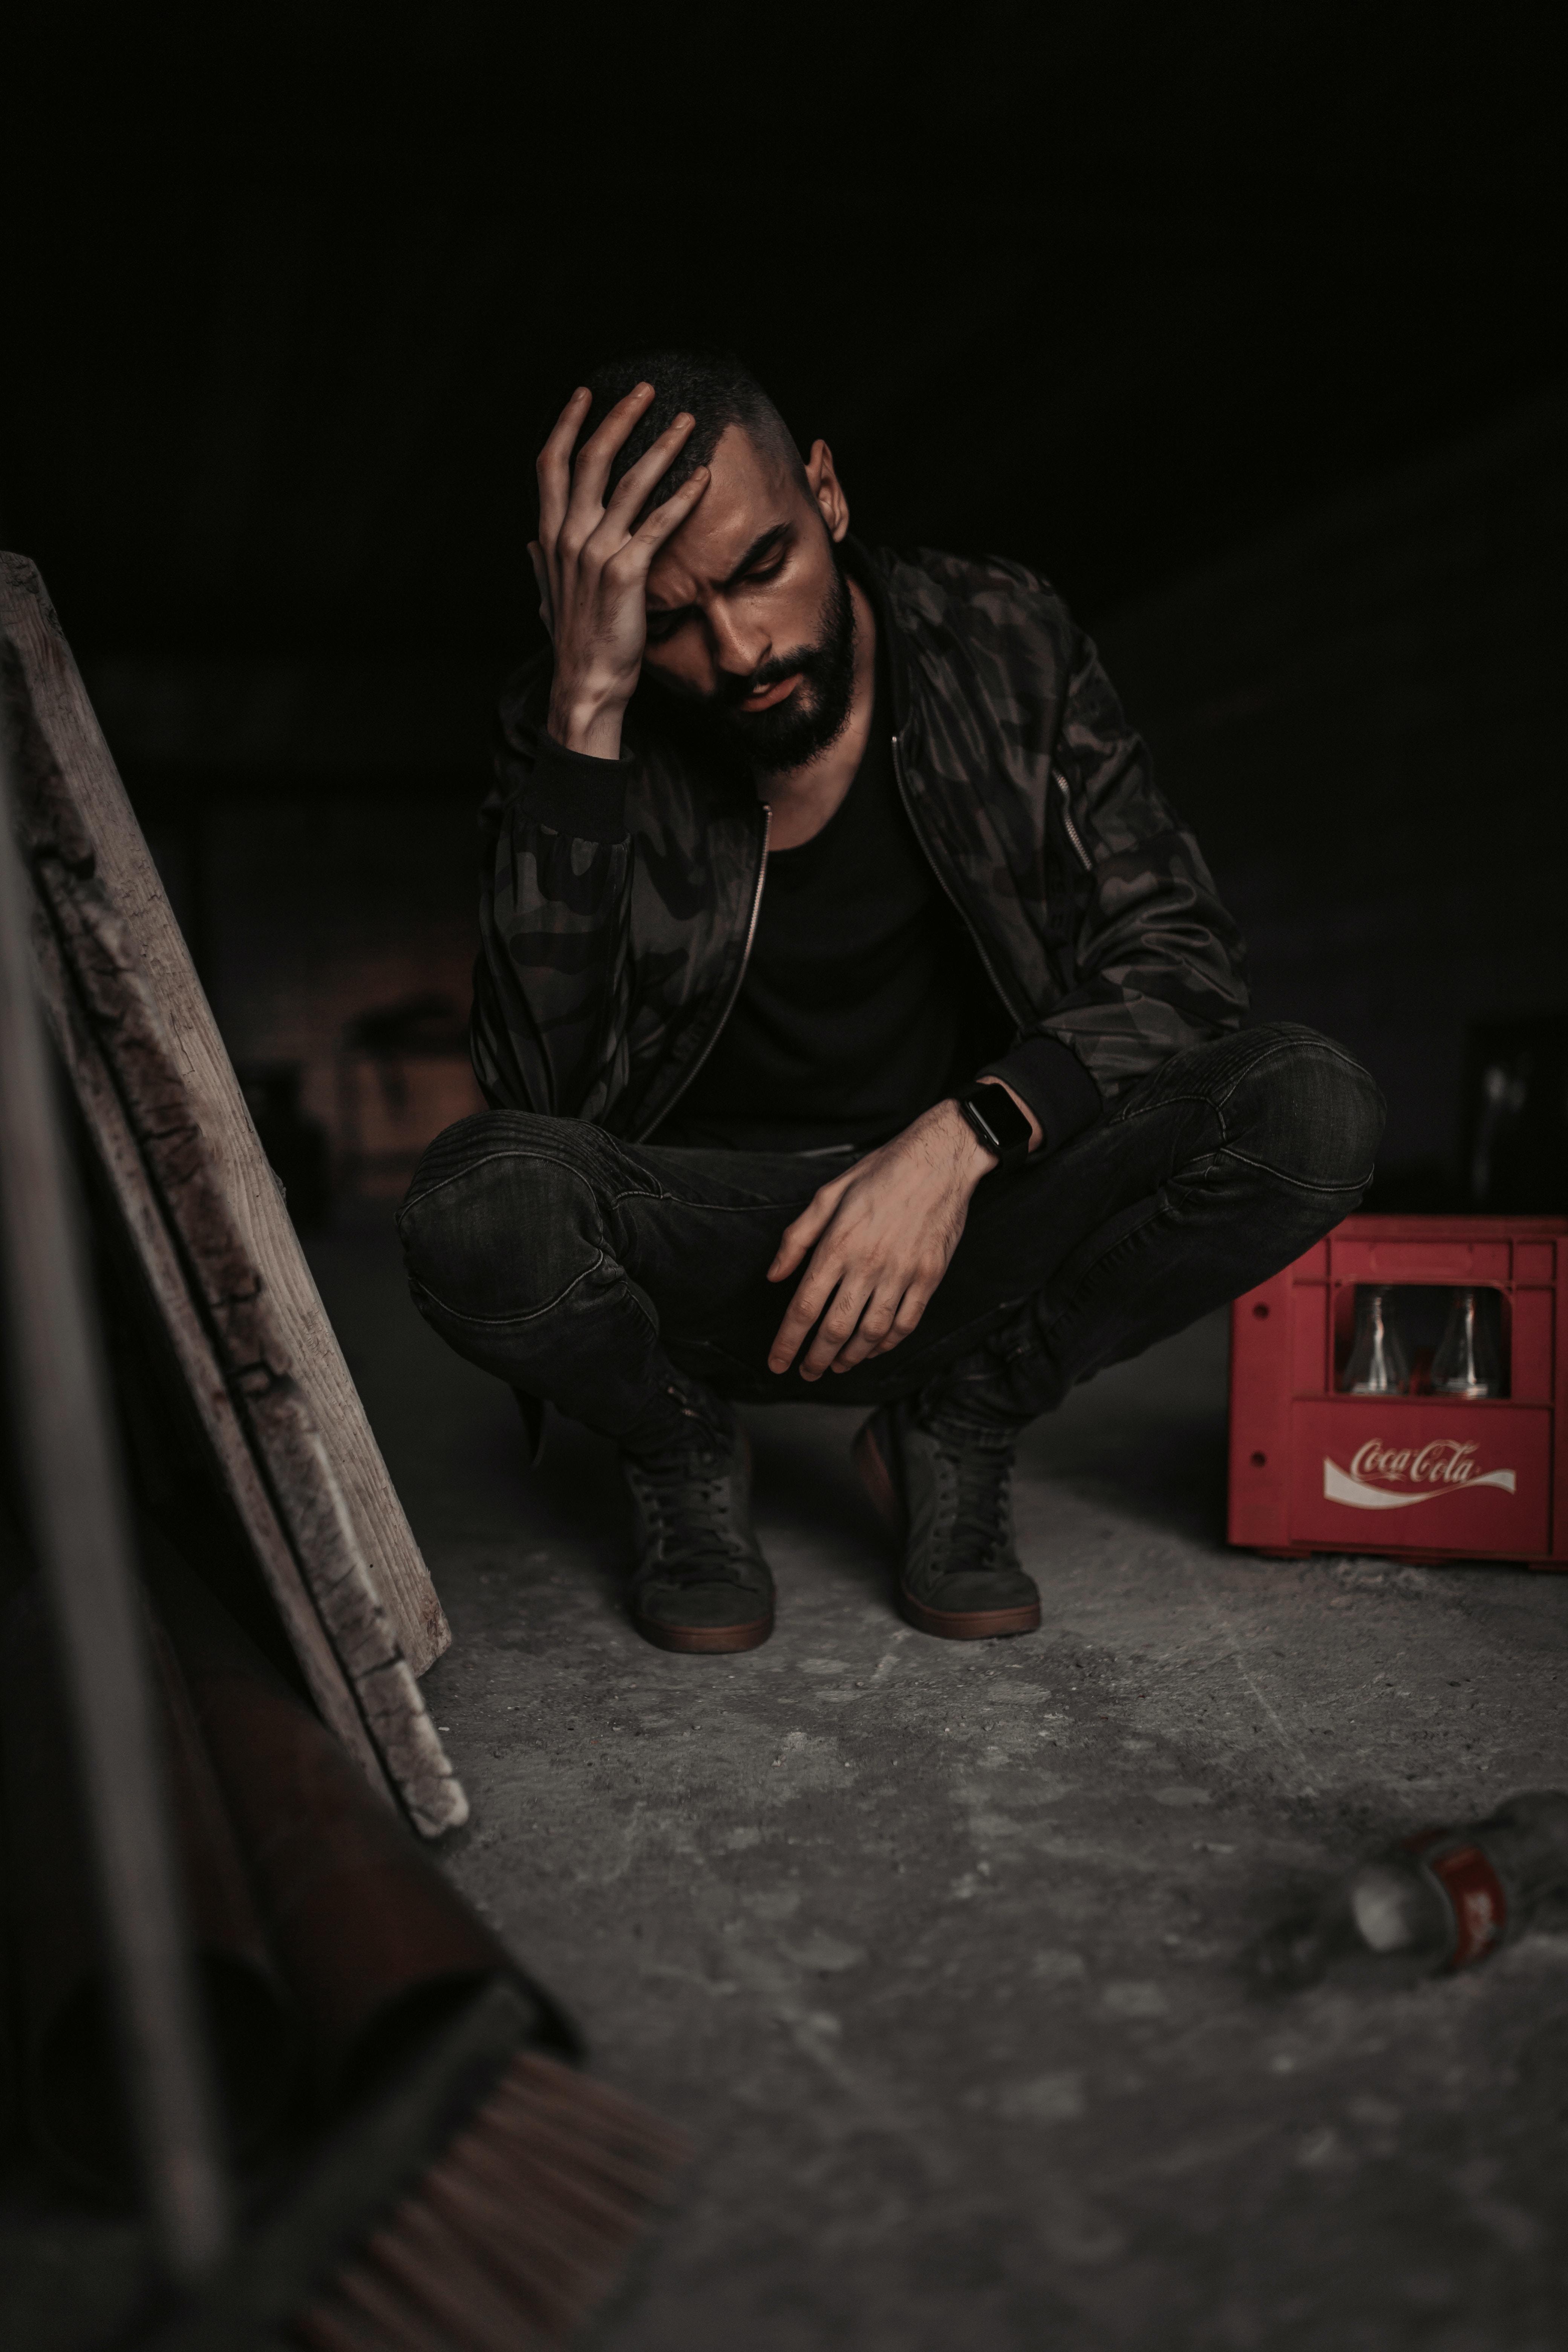 man sitting beside Coca-Cola plastic crate